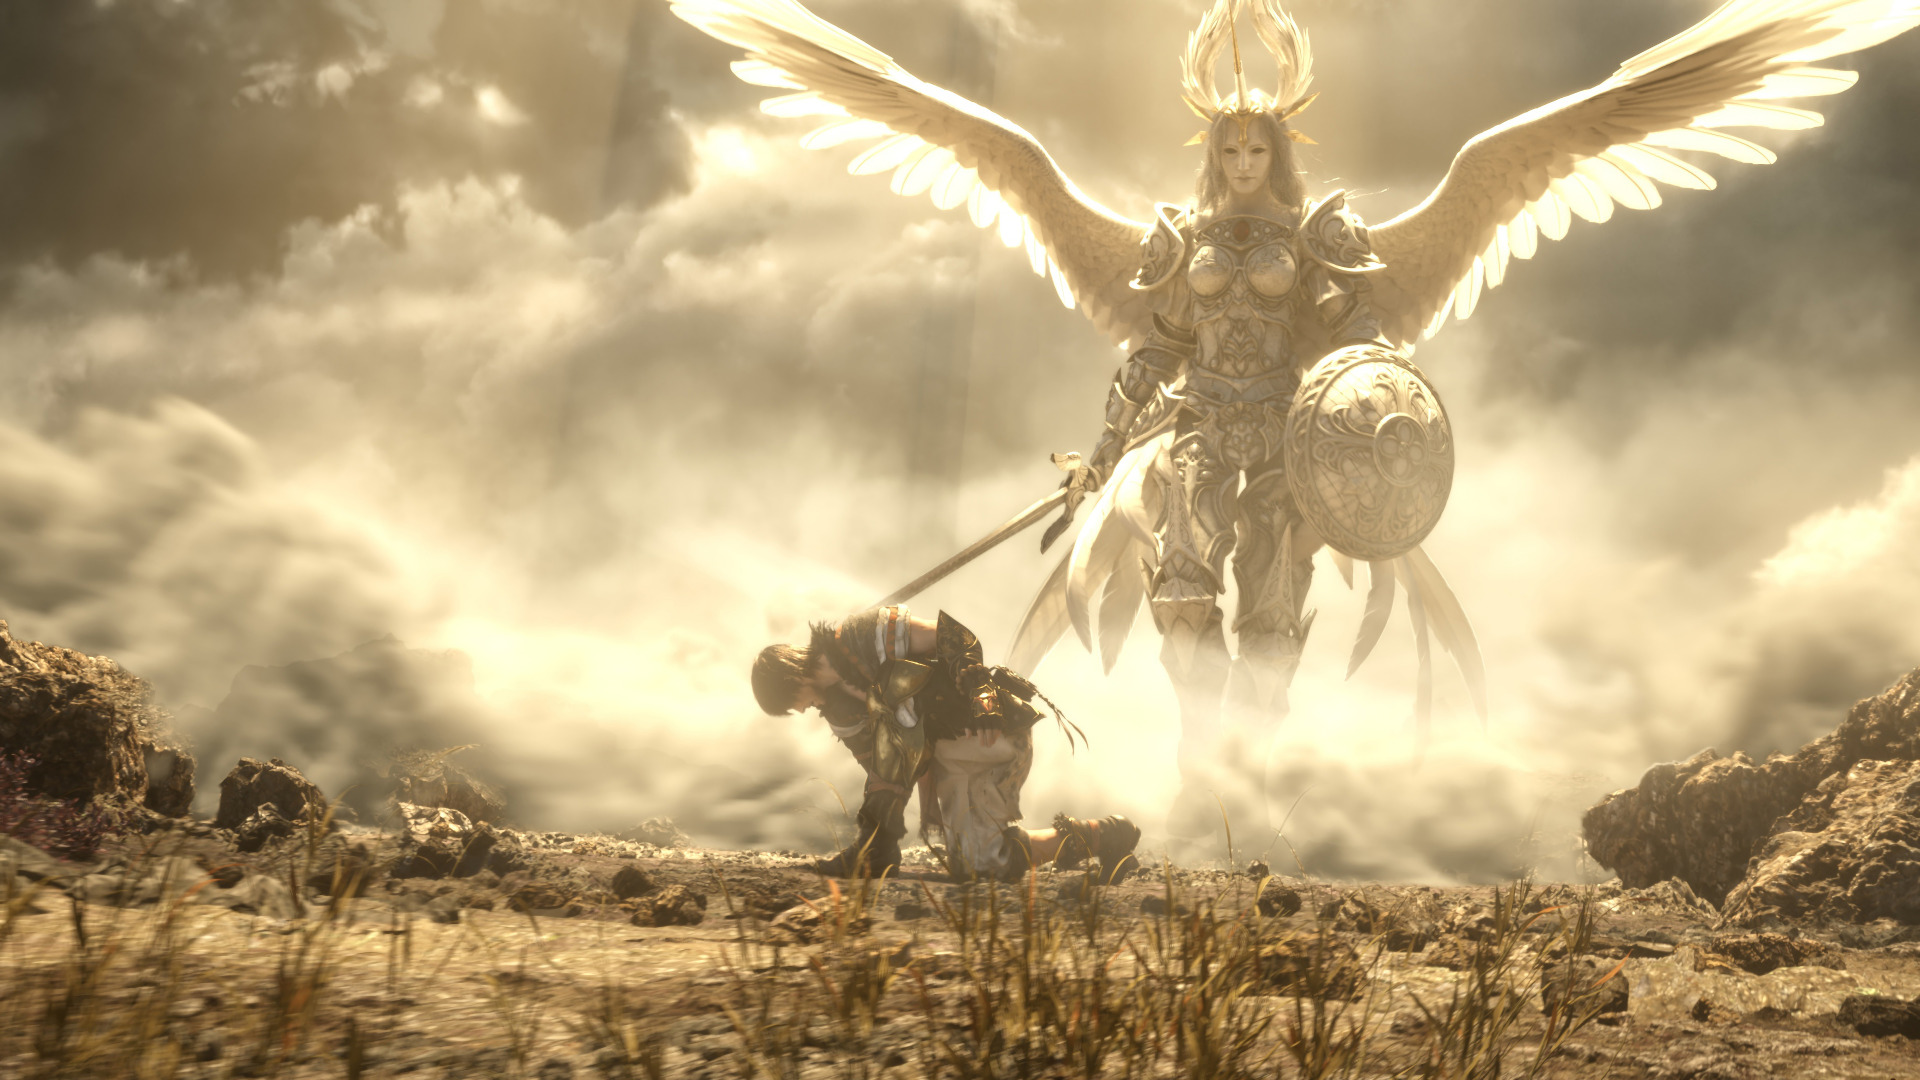 Final Fantasy XIV HD Wallpaper | Background Image ...